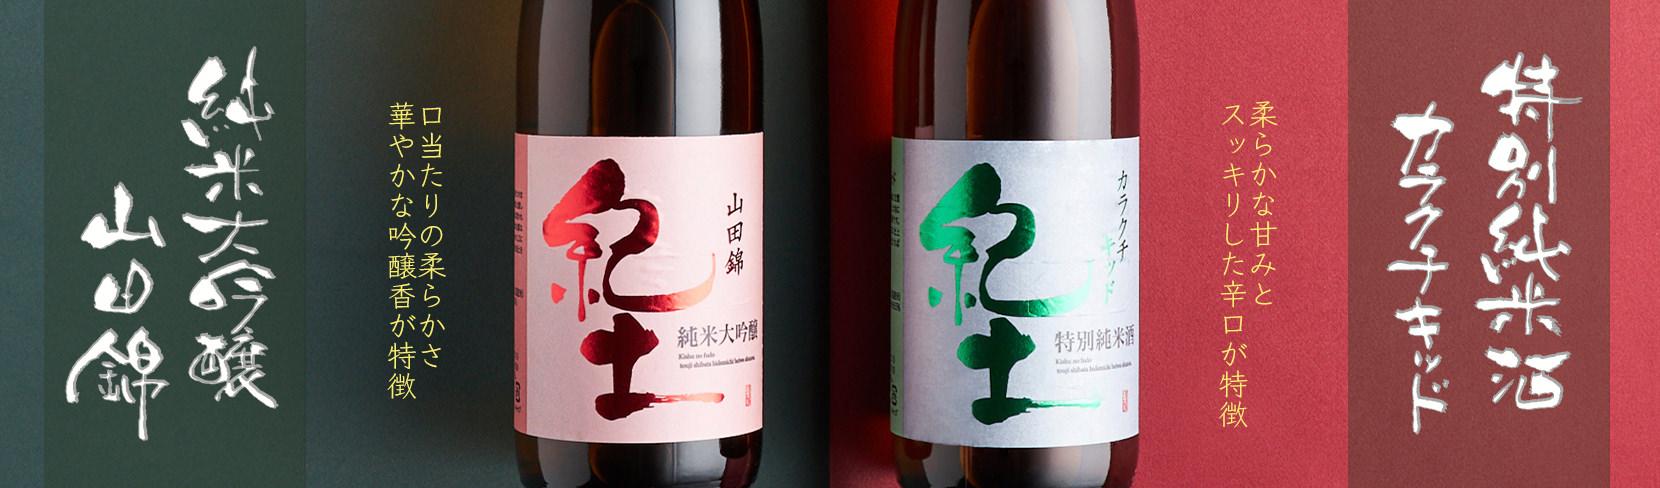 紀土   和歌山の平和酒造の日本酒